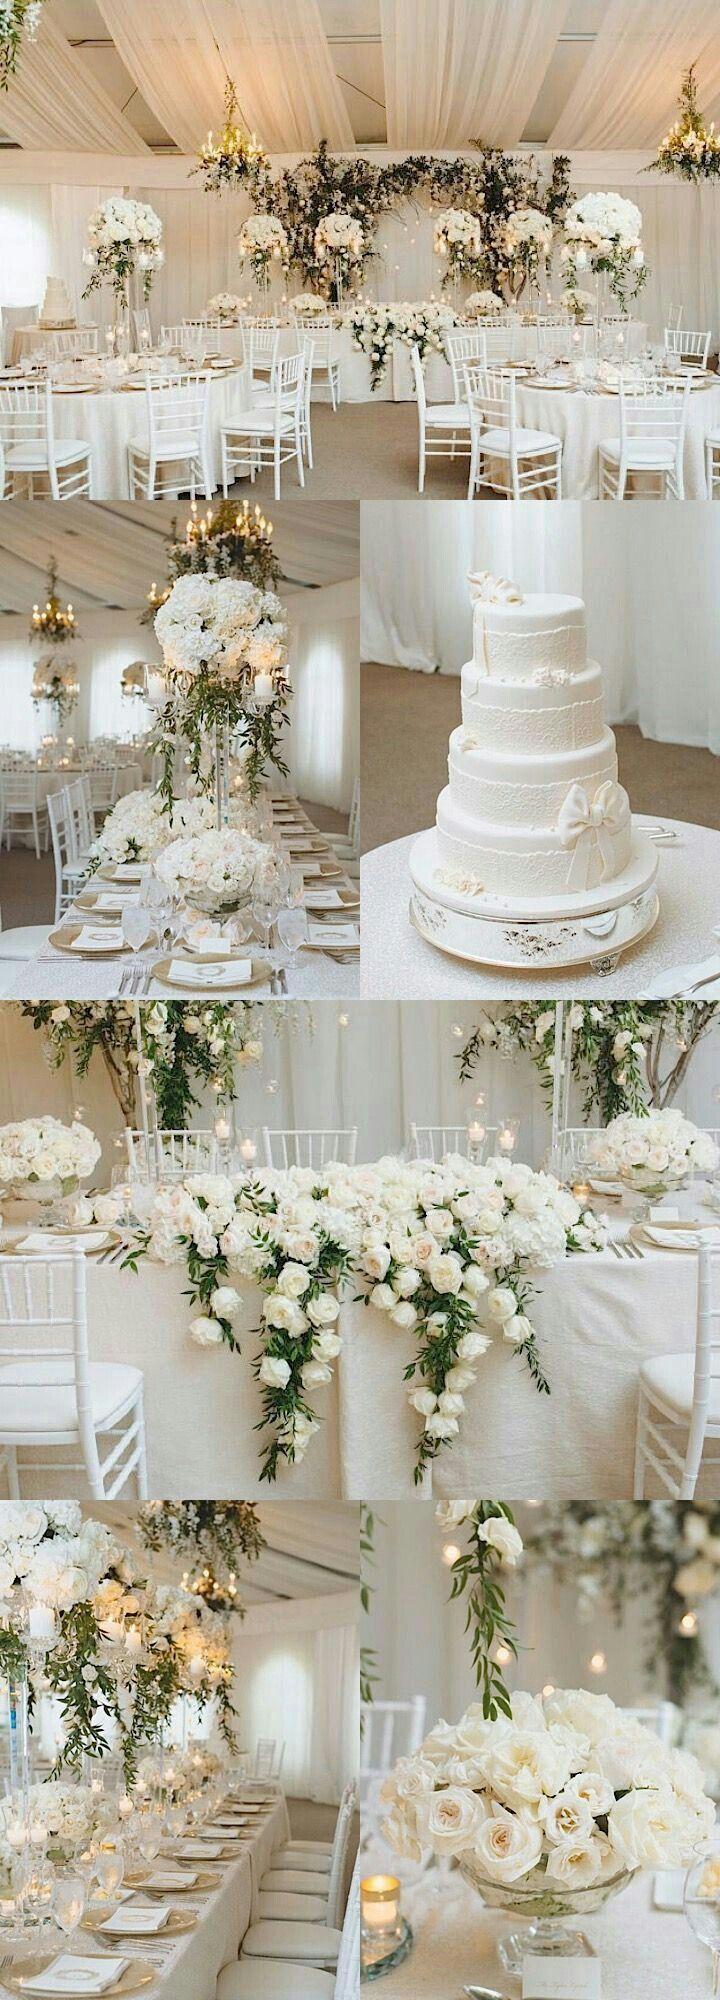 Wedding cake table decoration ideas  Reception and cake  Wedding decoration  Pinterest  Reception